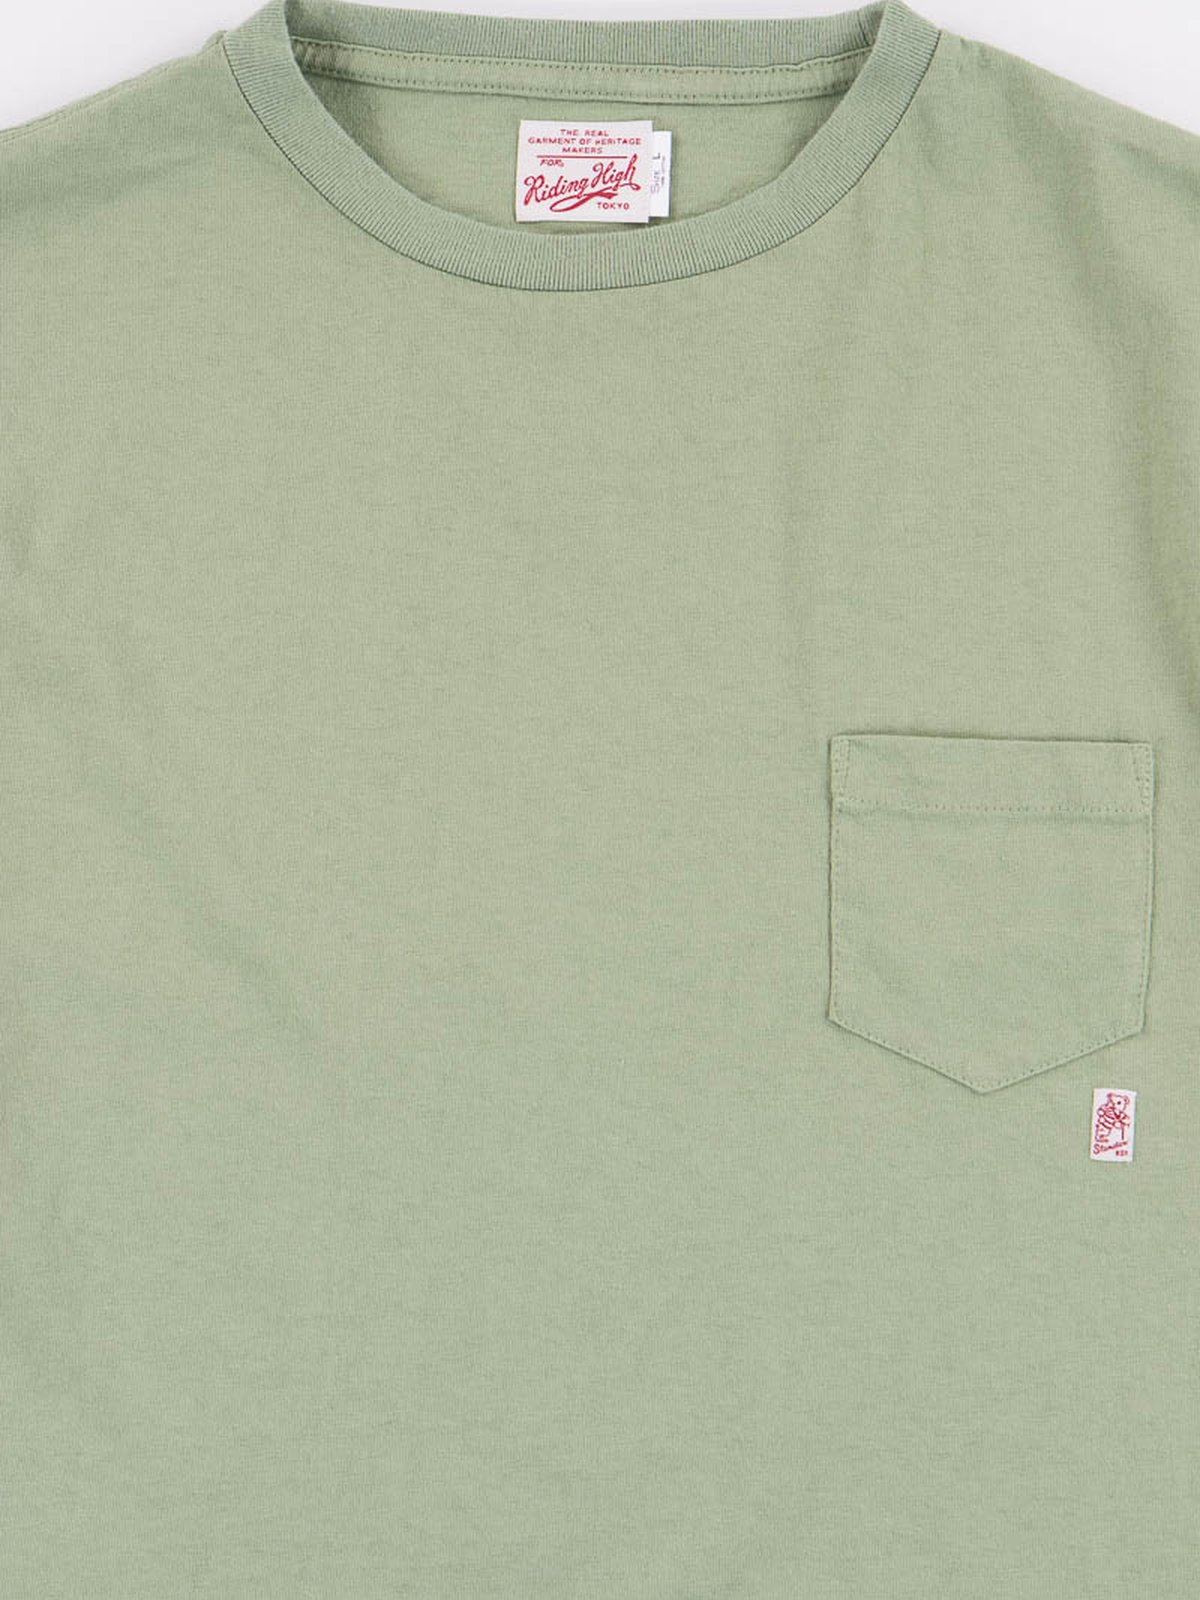 Green Standard Pack Pocket Tee - Image 2